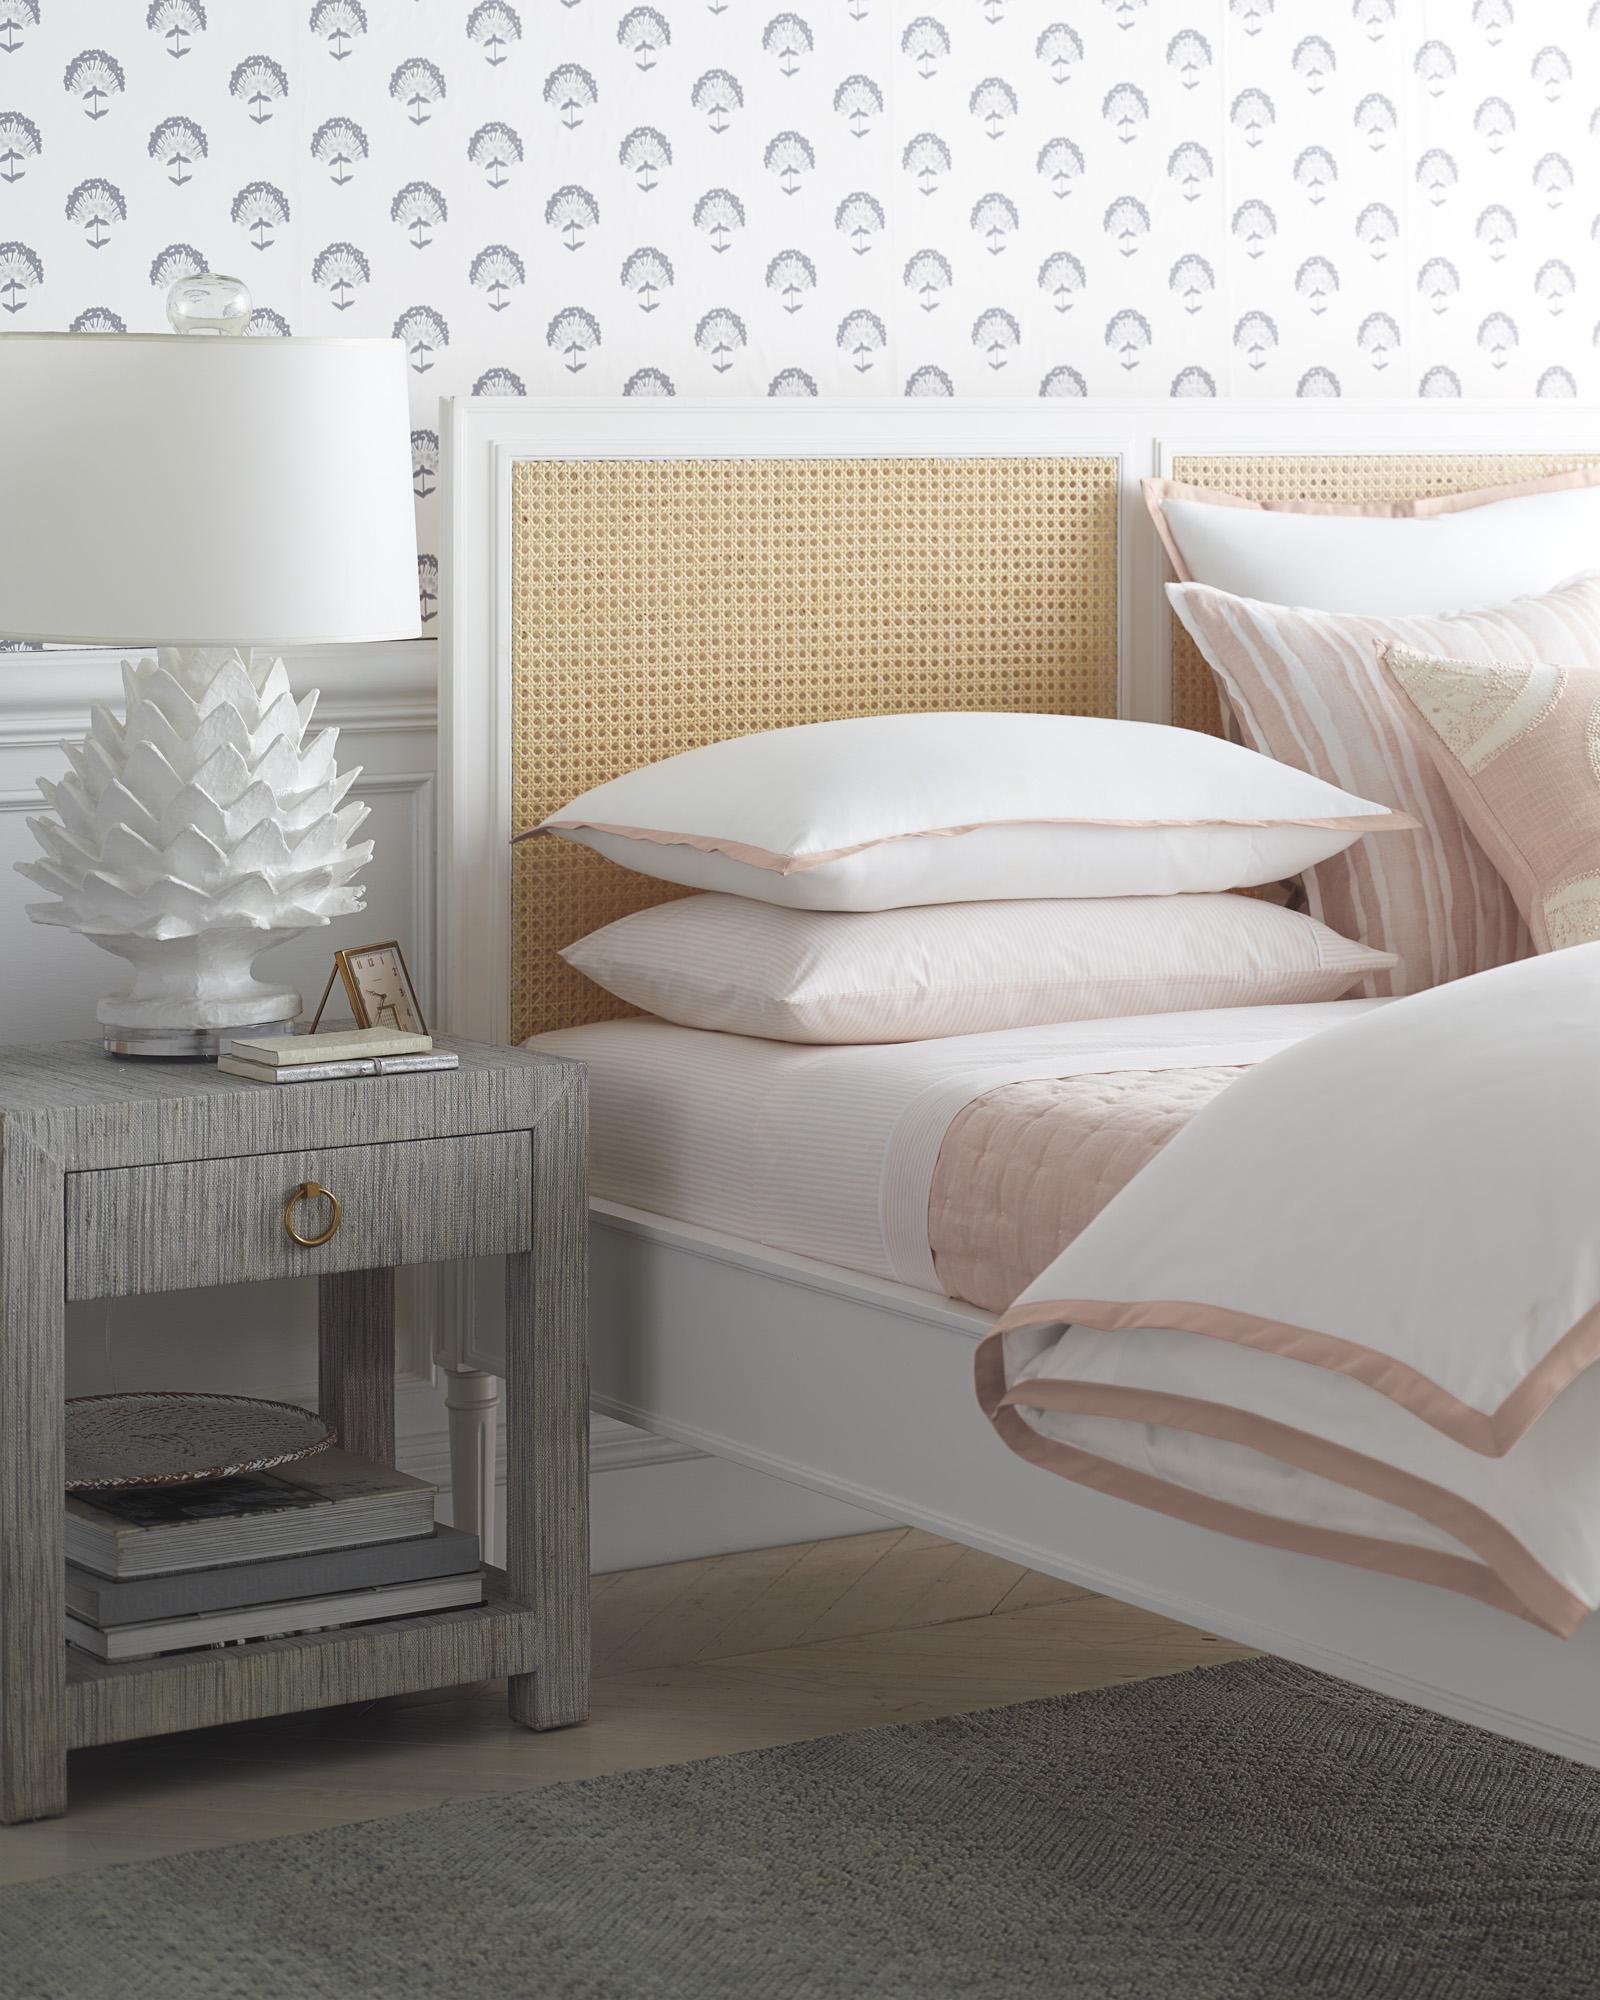 Border Frame Standard Sham - Pink Sand - Insert sold separately